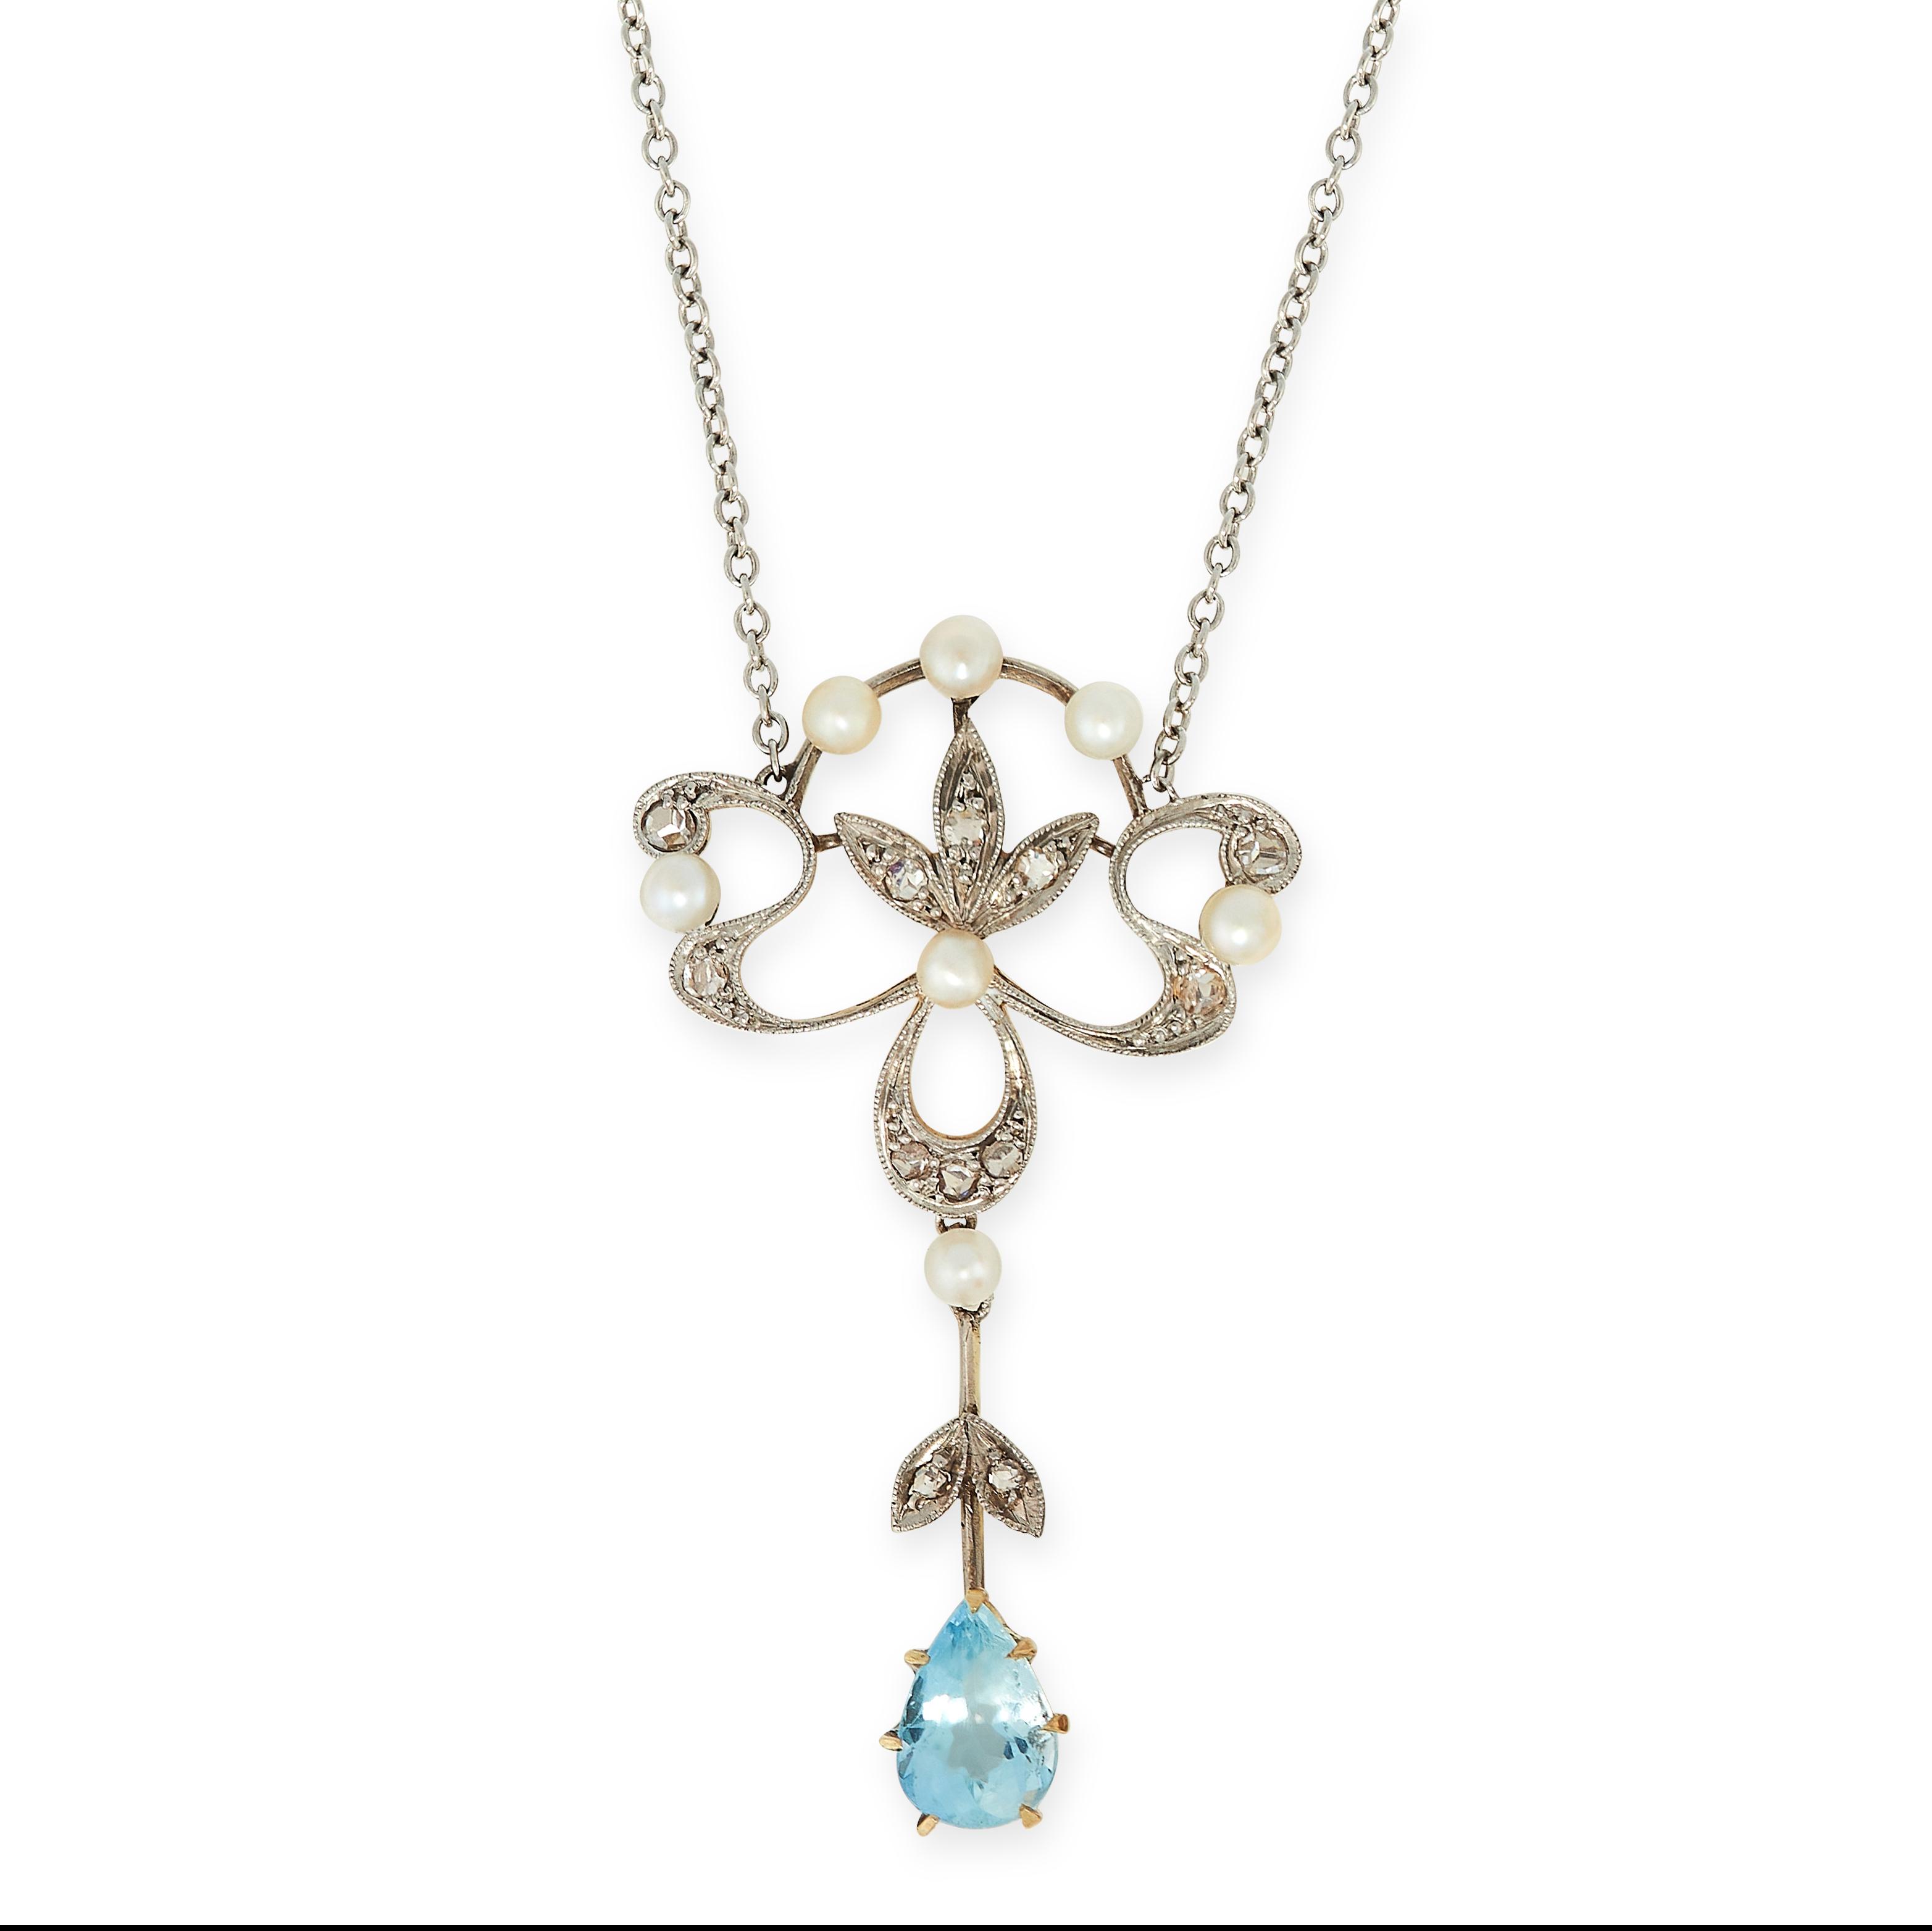 ANTIQUE EDWARDIAN AQUAMARINE, DIAMOND AND PEARL PENDANT NECKLACE in scrolling foliate design, set